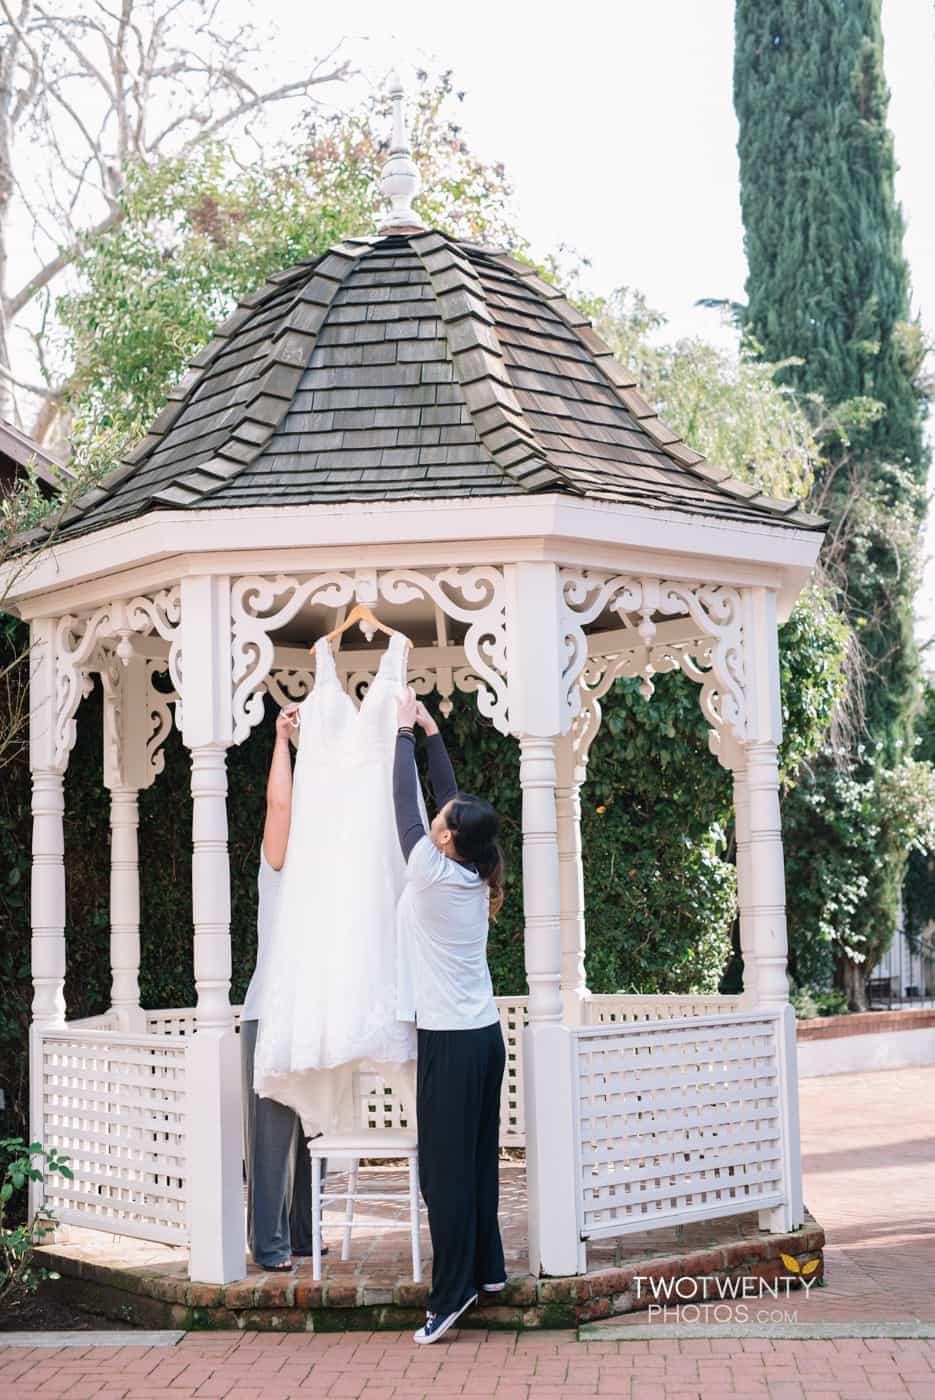 vizcaya-pavilion-sacramento-wedding-photographer-25